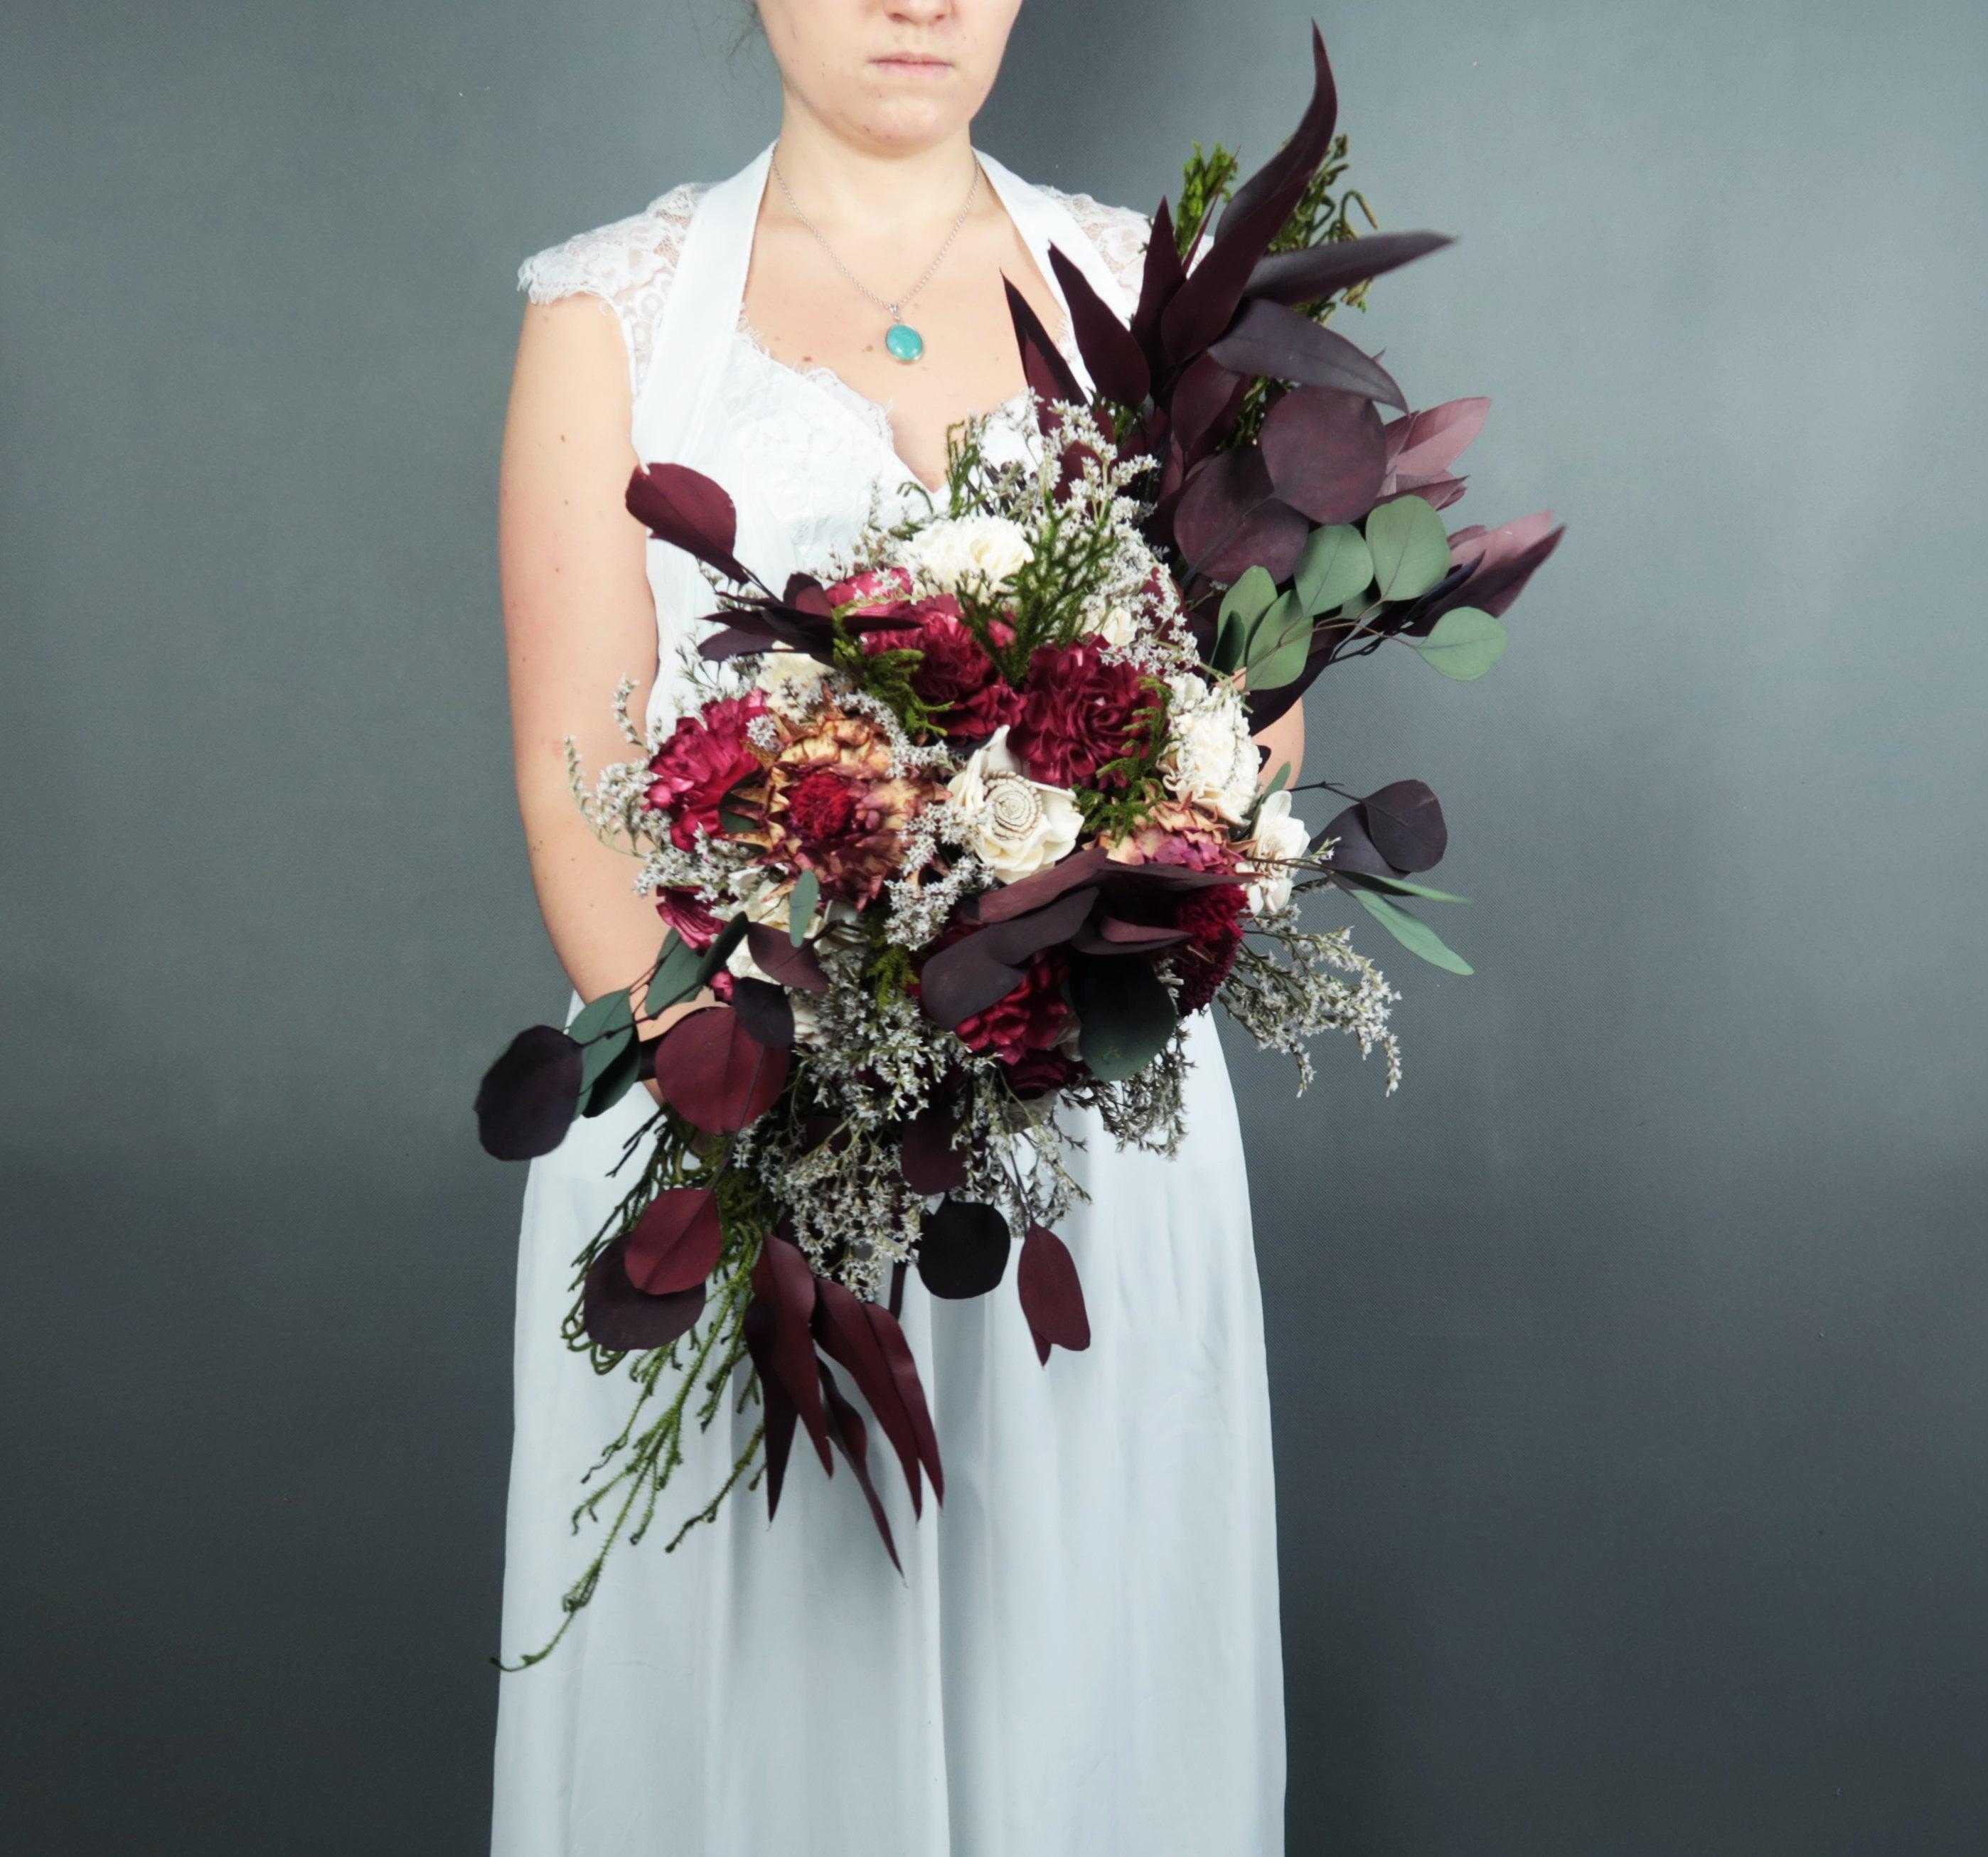 Wedding Arch Flowers Arrangement Boho Style Sola Flowers